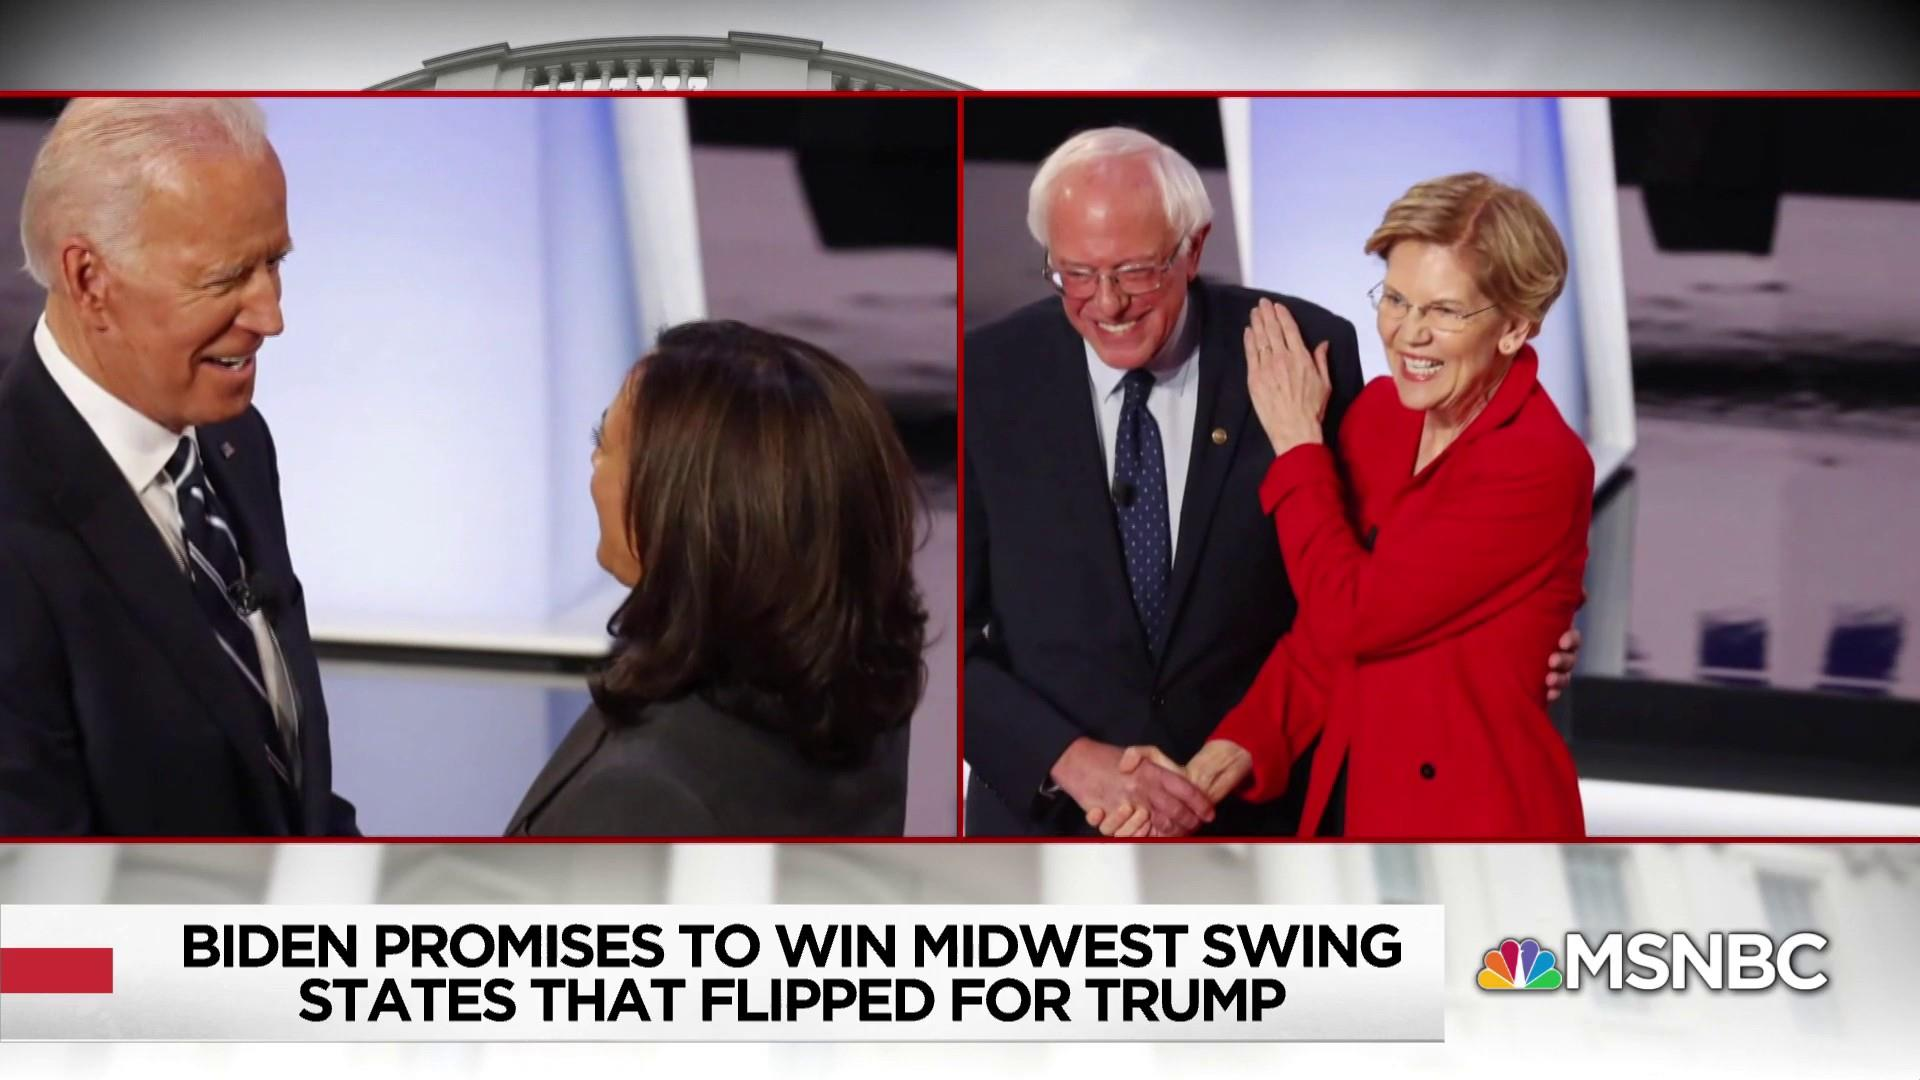 Two debates down, when will we see Biden vs. Warren?